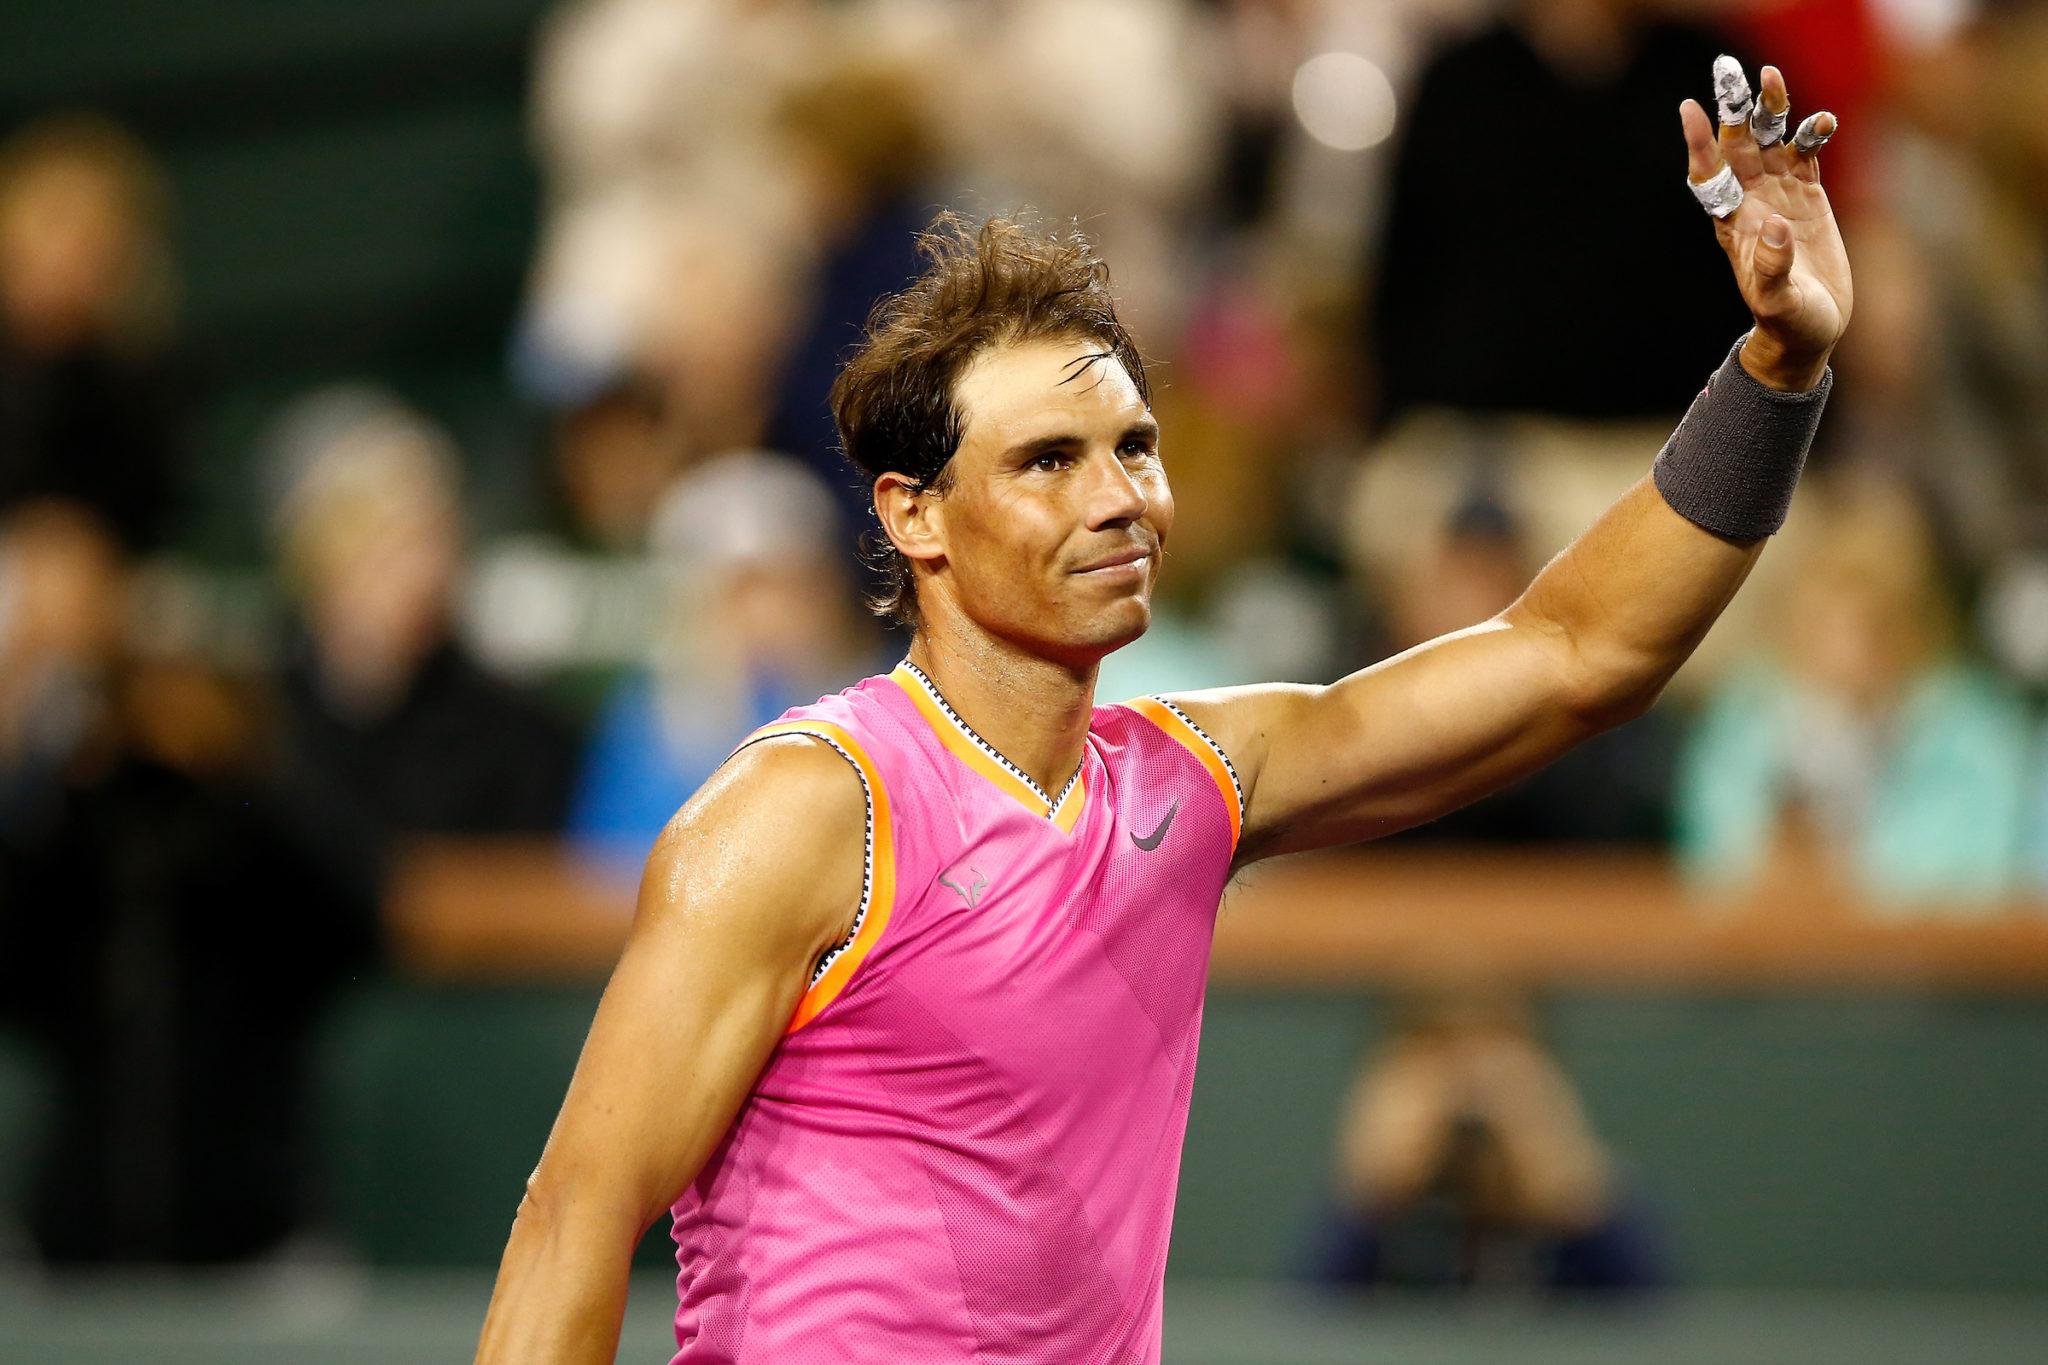 Rafael Nadal - Wednesday, March 13, 2019 - Bnp Paribas Open